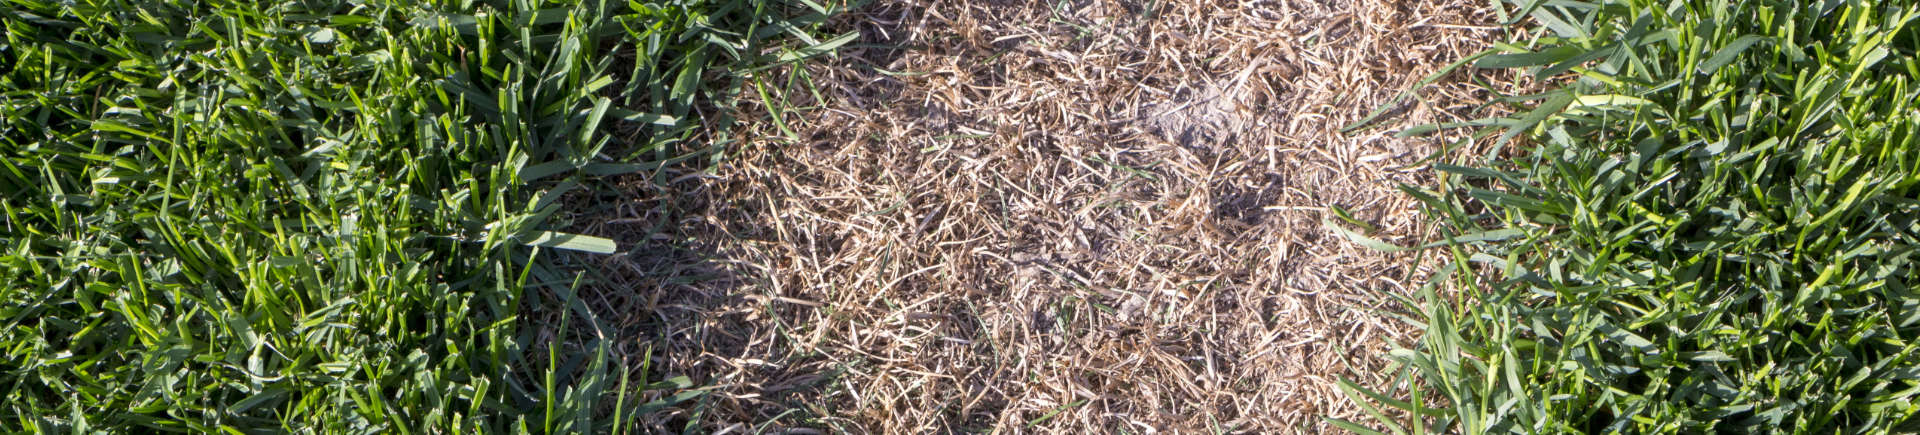 brown spot in lawn